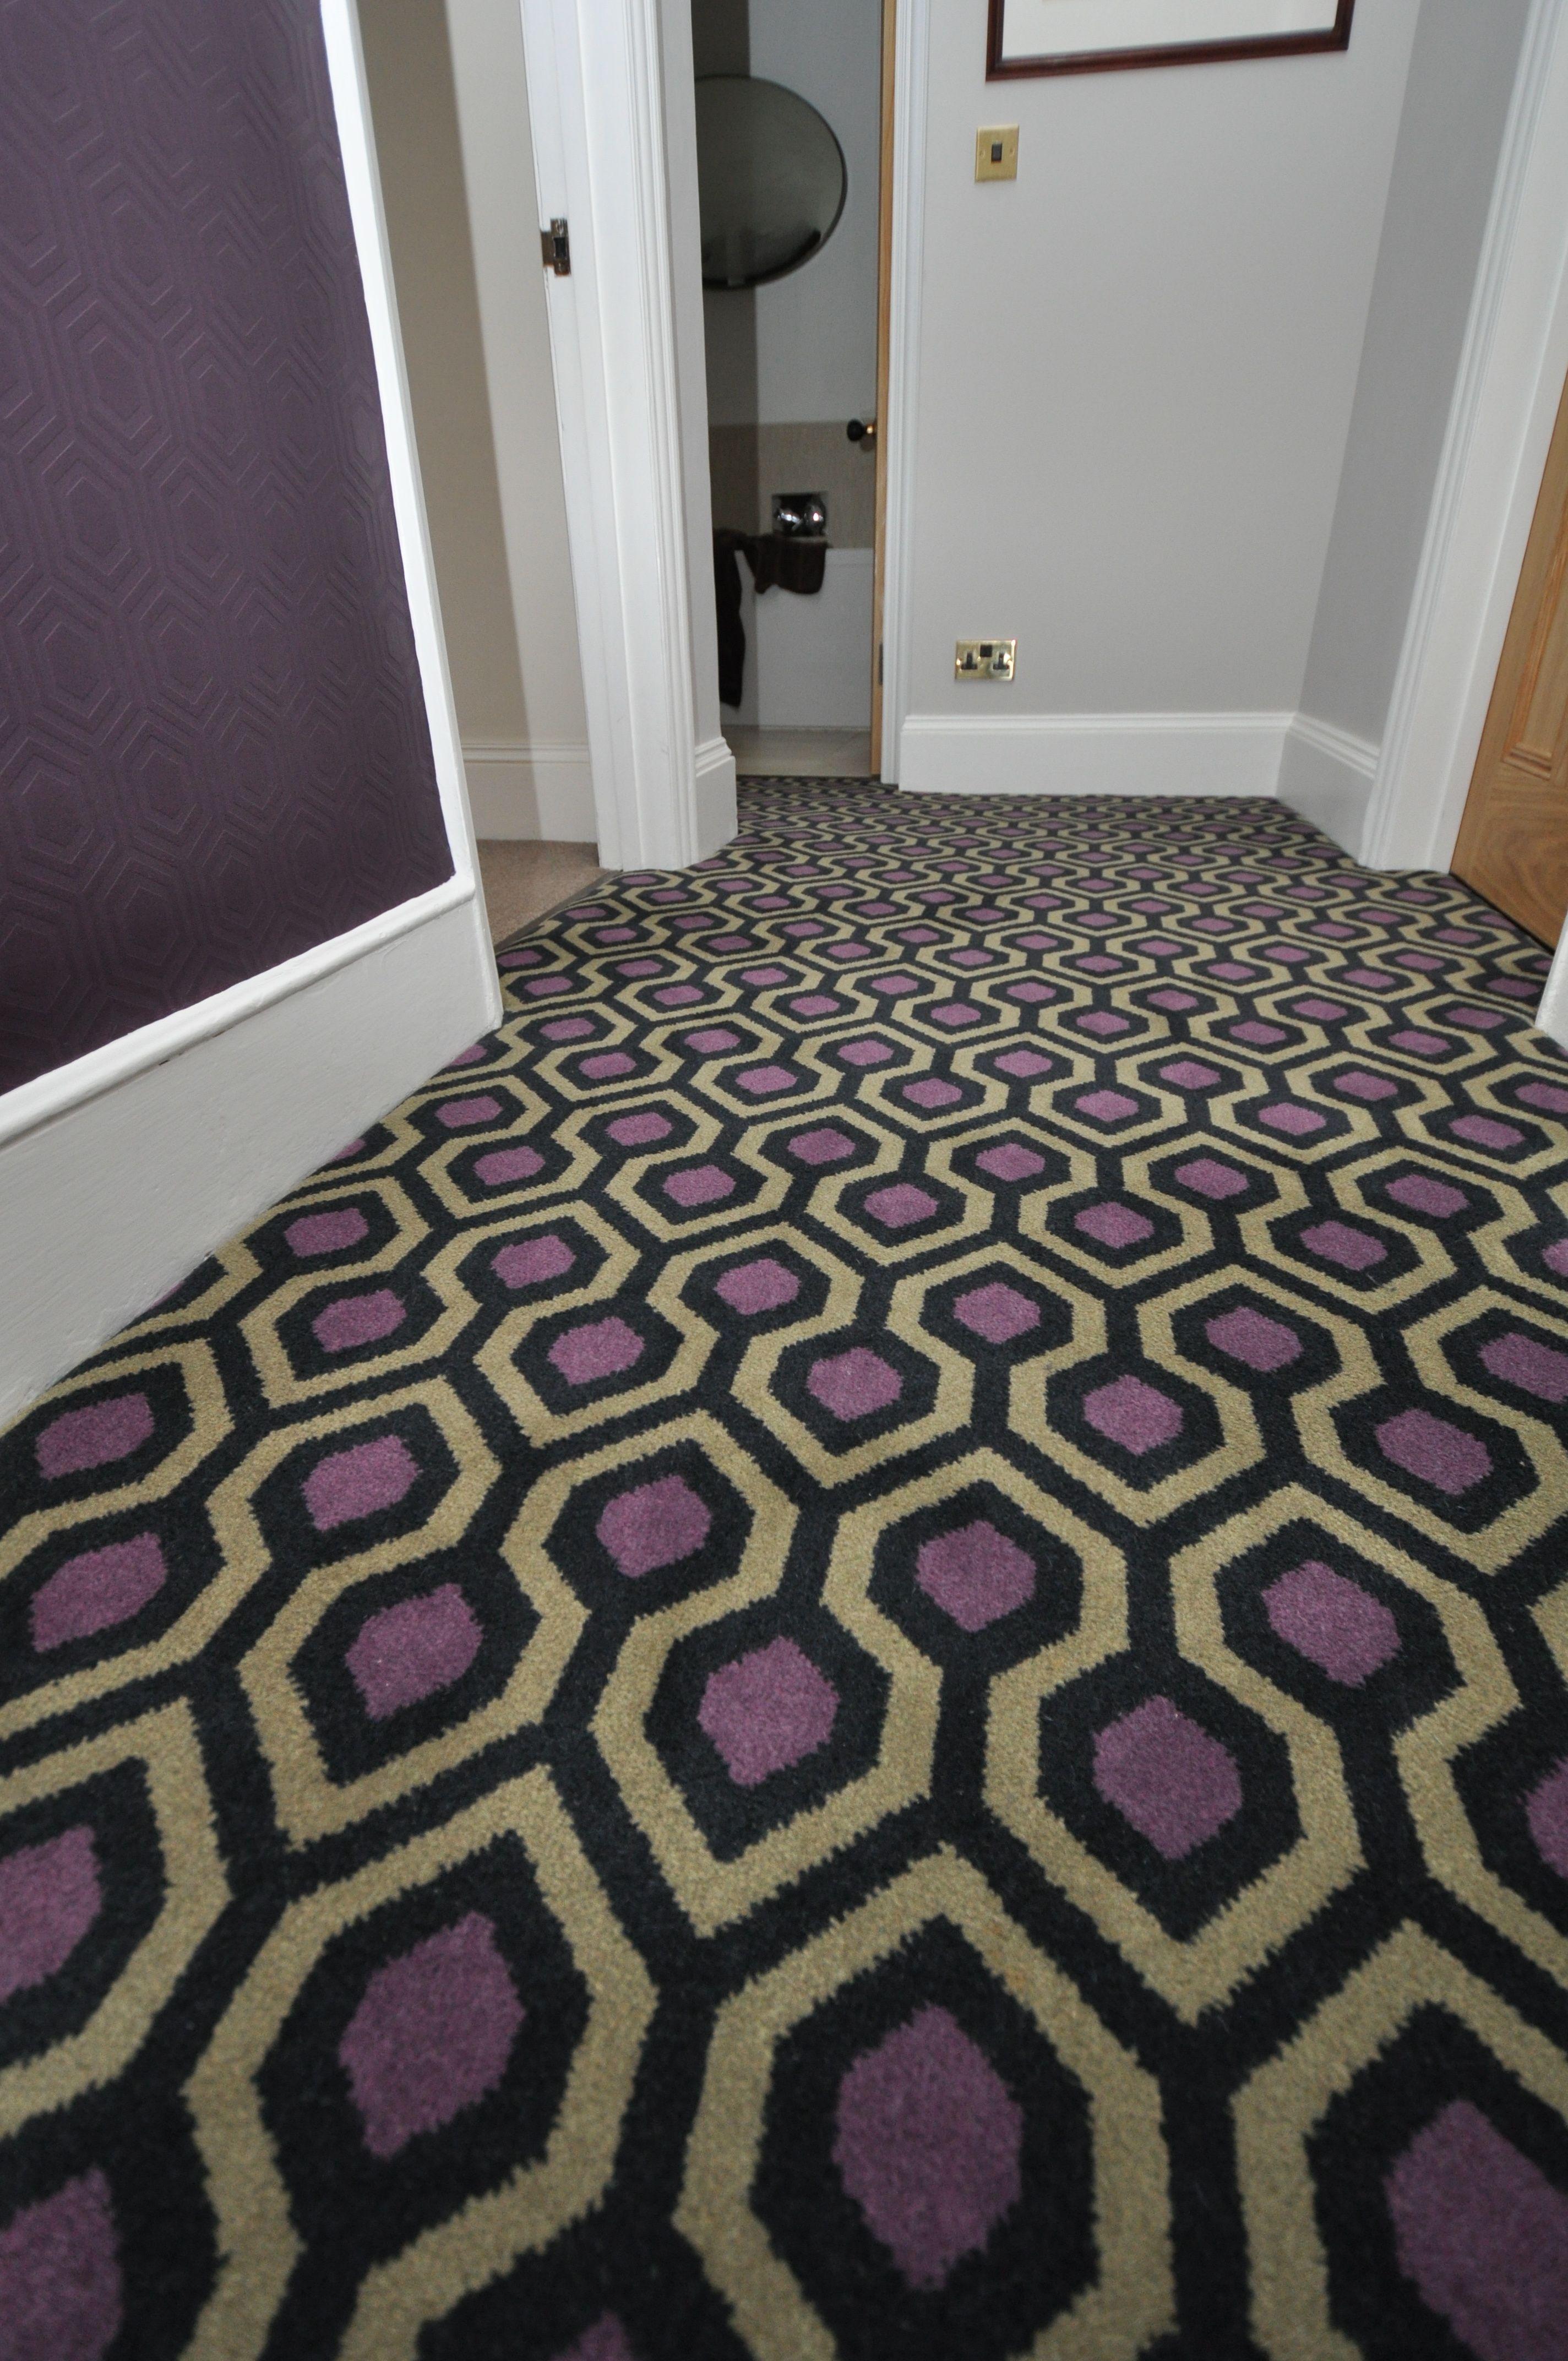 4 085 Geometric Carpet Bowloom Bespoke Geometric Carpet Fitted In Kent Geometric Carpet Carpet Fitting Carpet